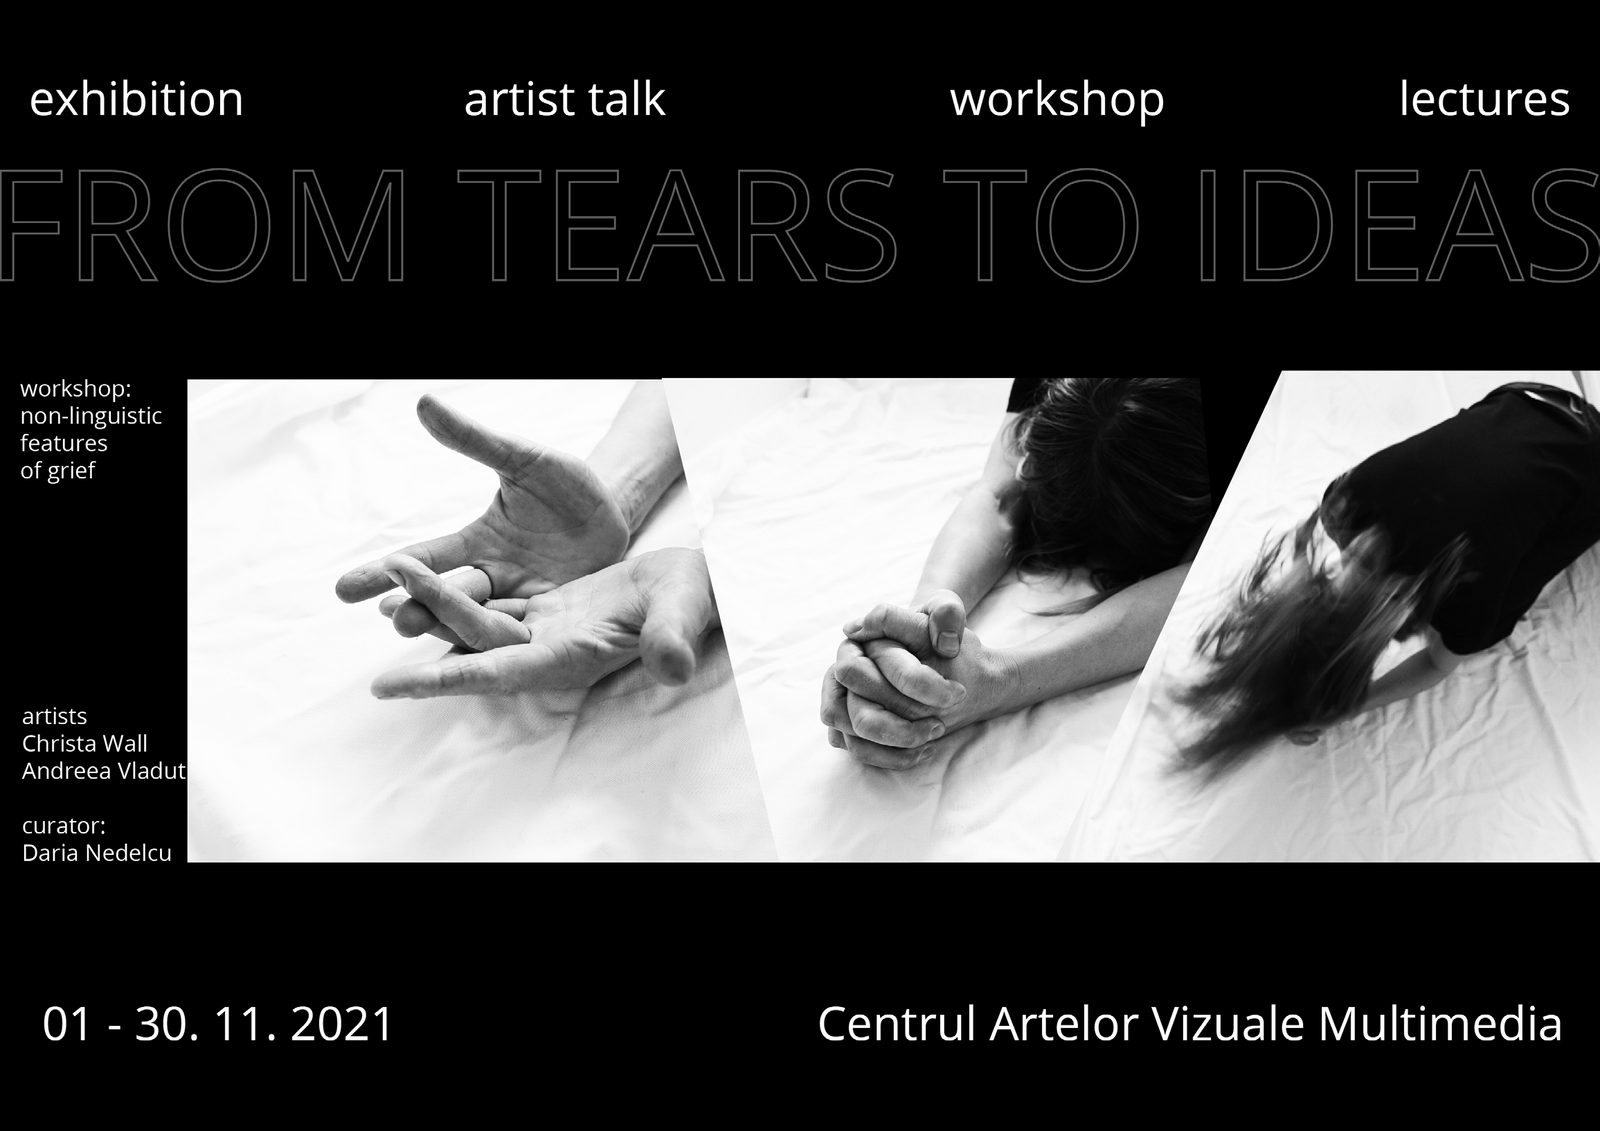 From Tears to Ideas_Chrita_Wahl_Andreea_vladut